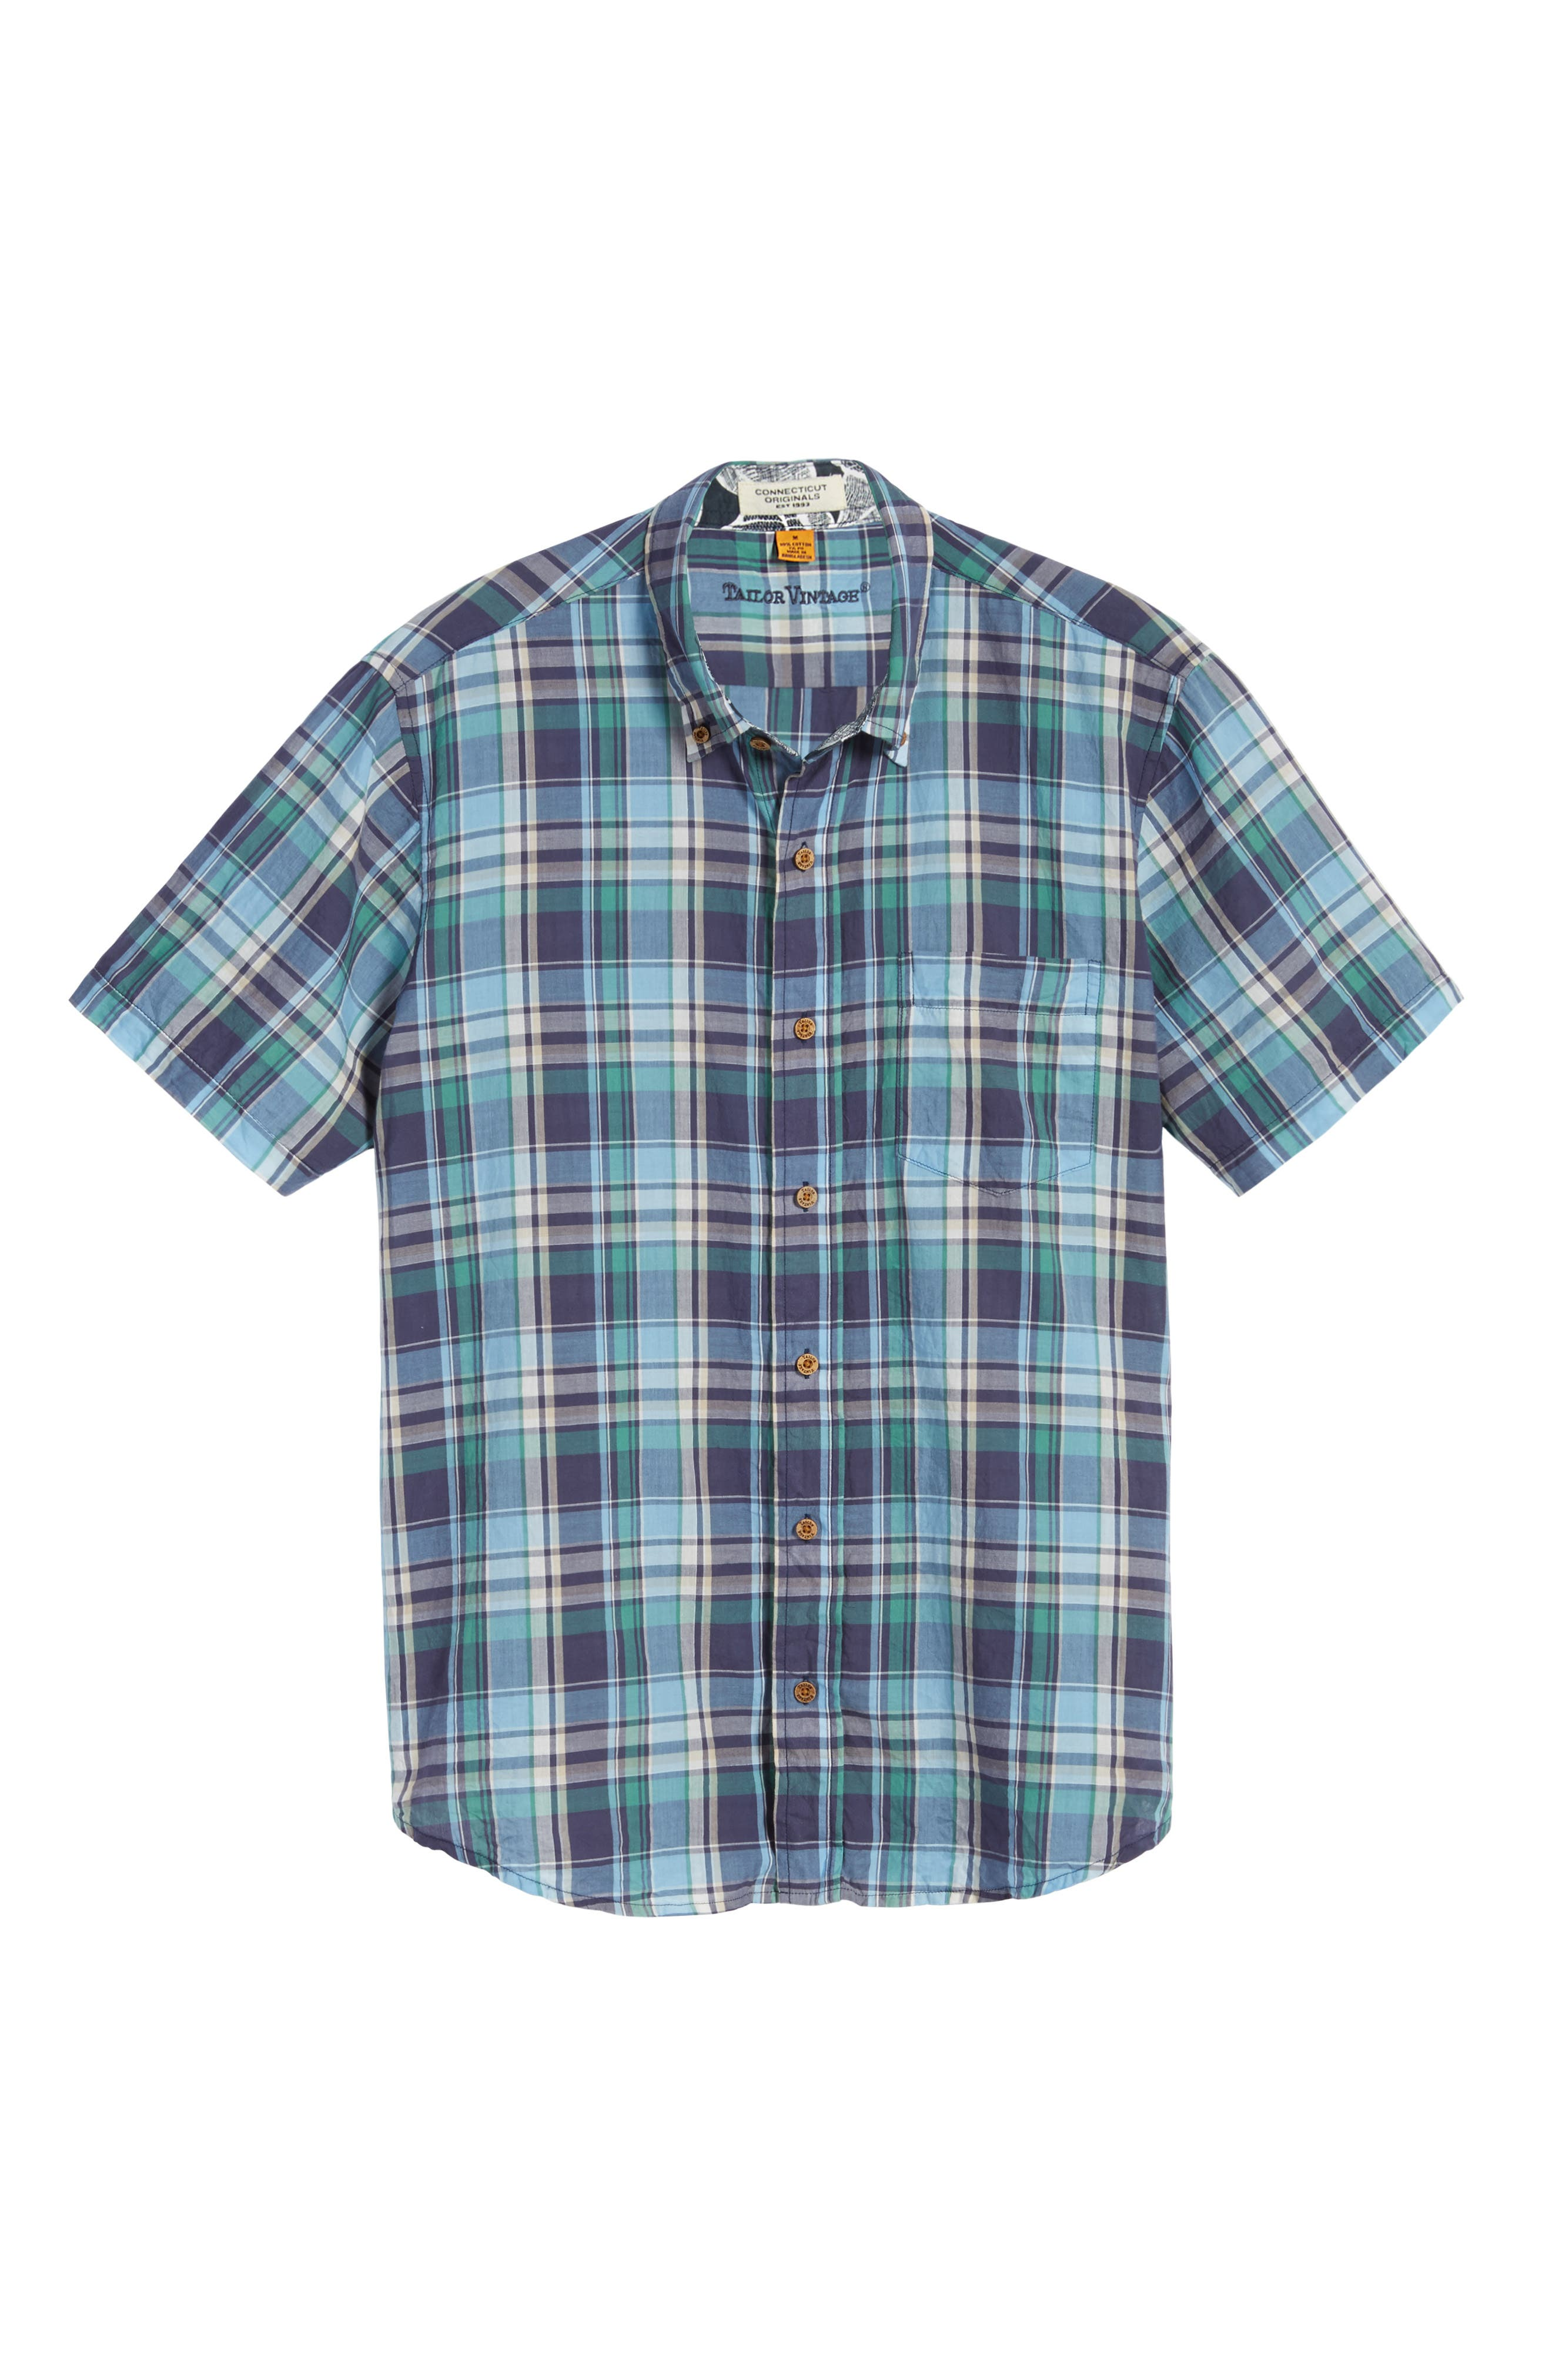 TAILOR VINTAGE,                             Crinkle Plaid Sport Shirt,                             Alternate thumbnail 6, color,                             424